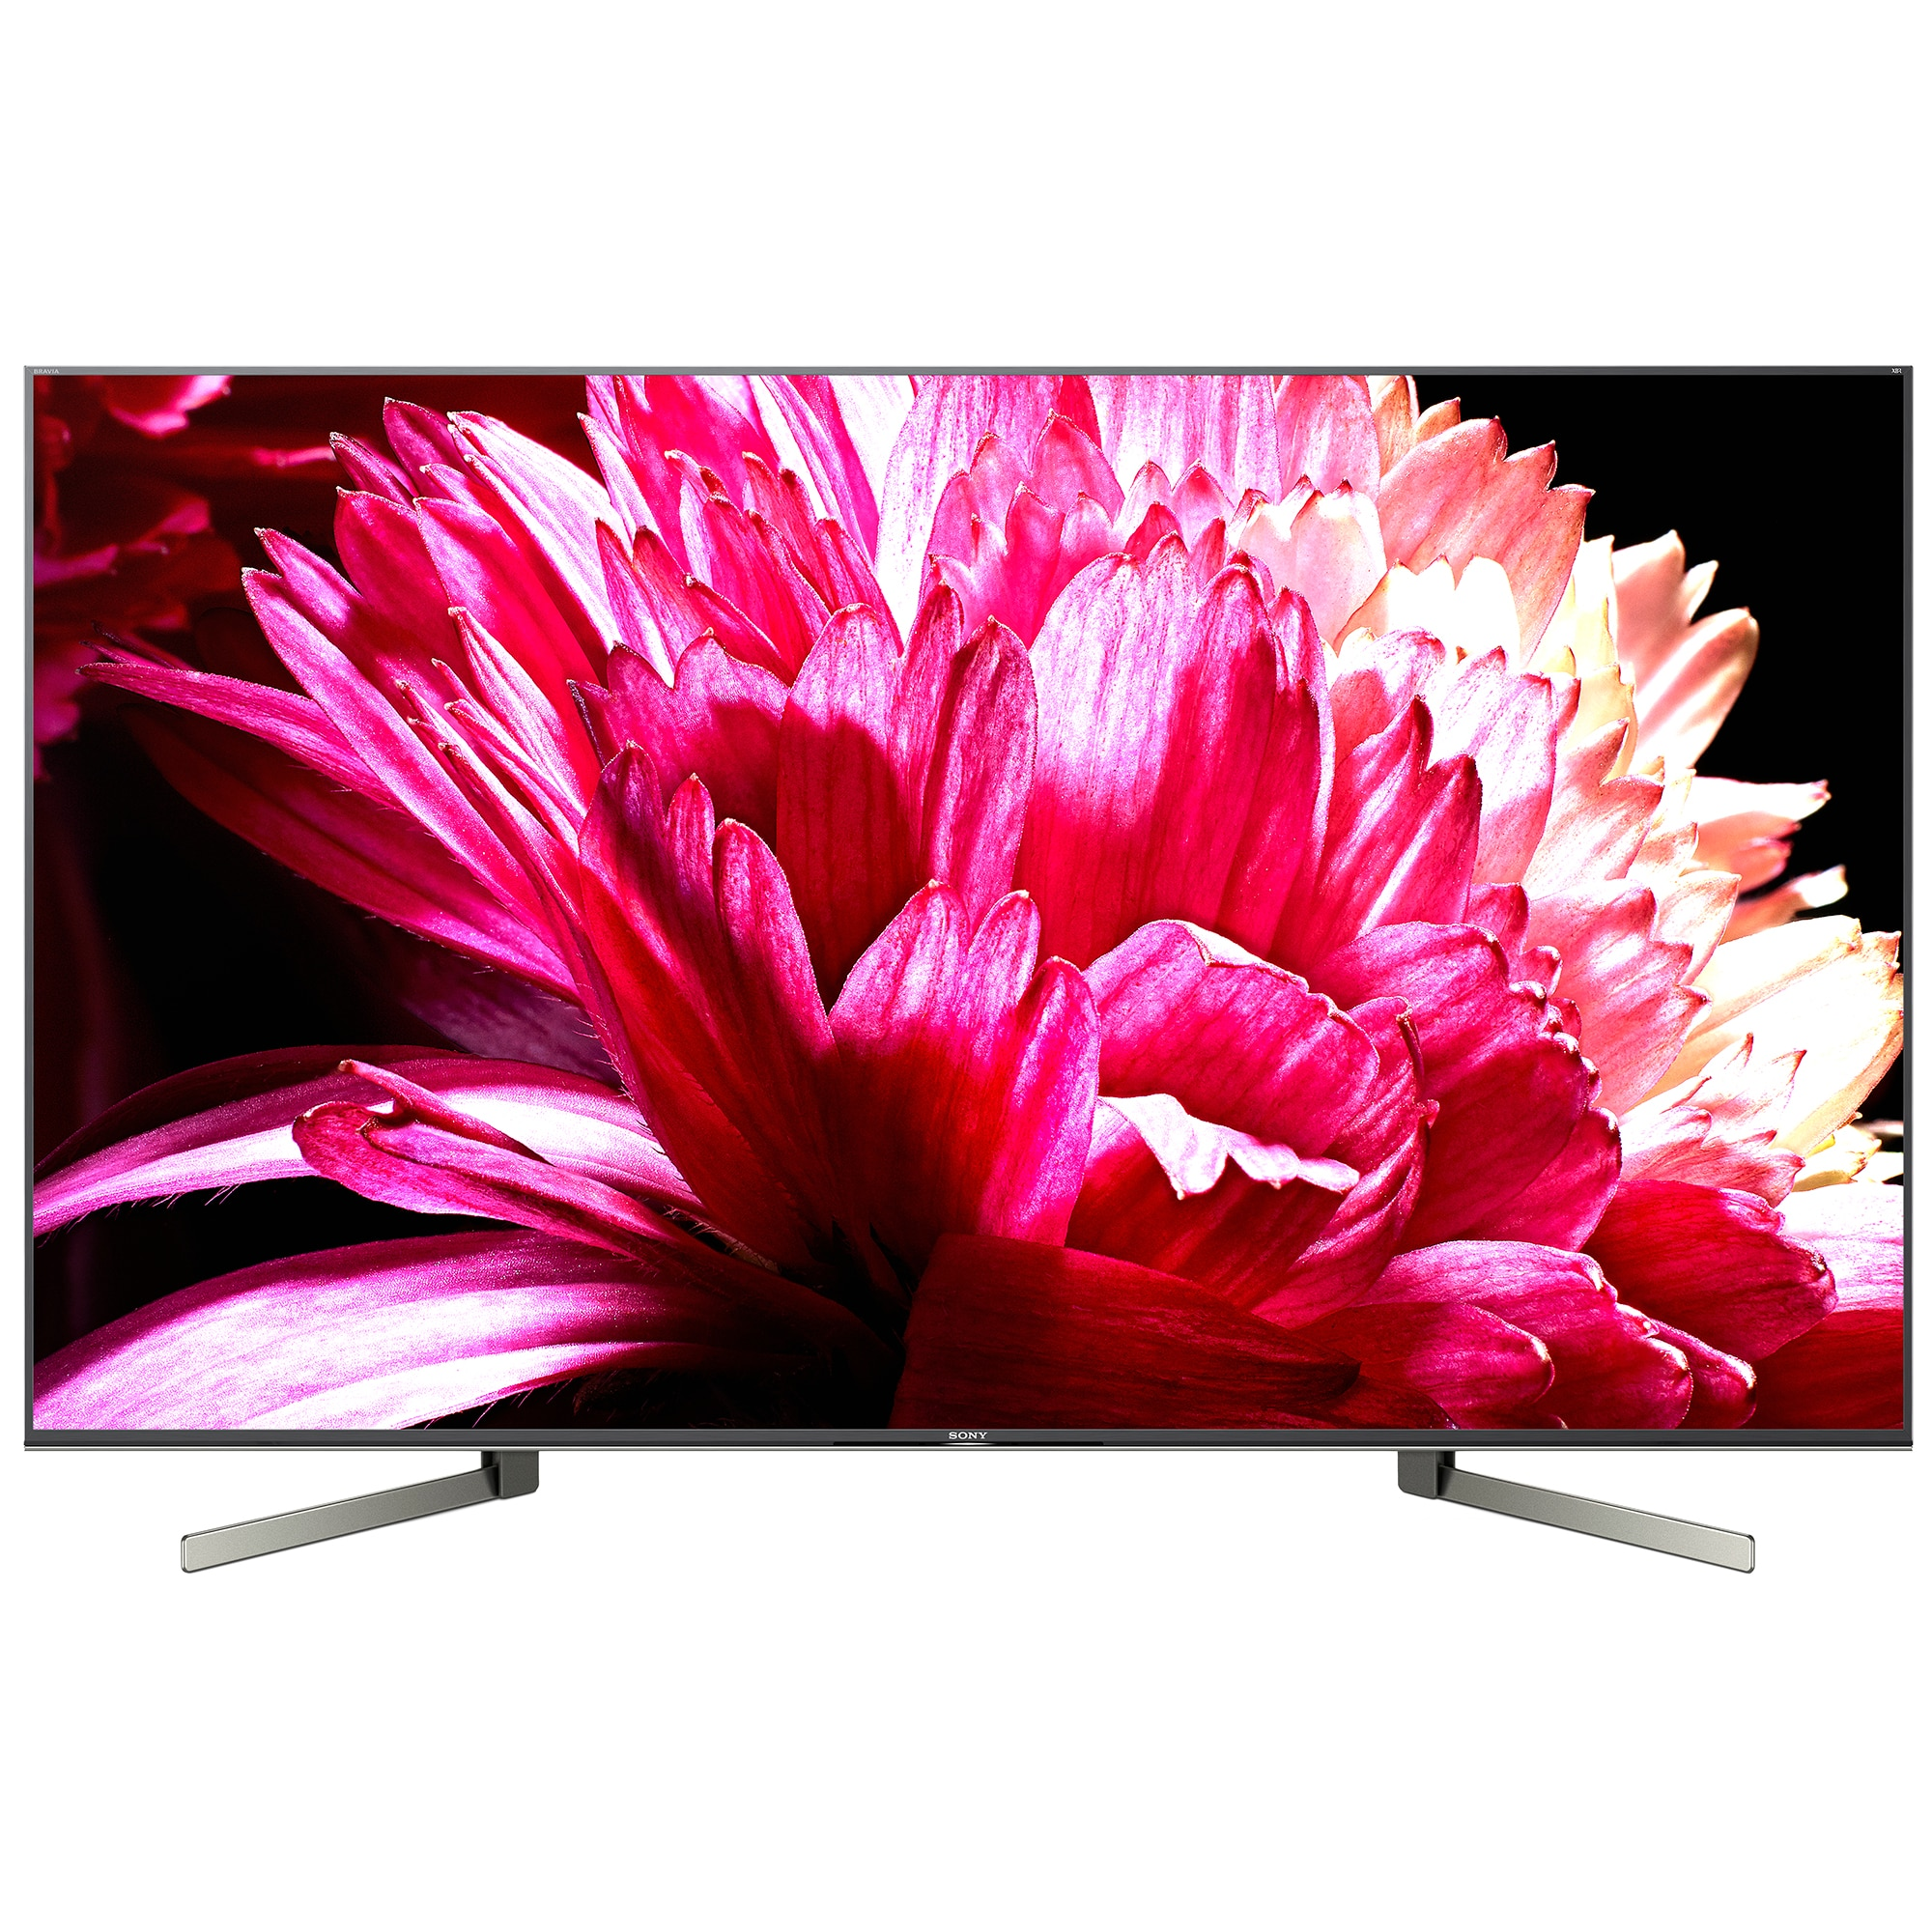 Fotografie Televizor Smart Android LED Sony BRAVIA, 189.3 cm, 75XG9505, 4K Ultra HD, Clasa B